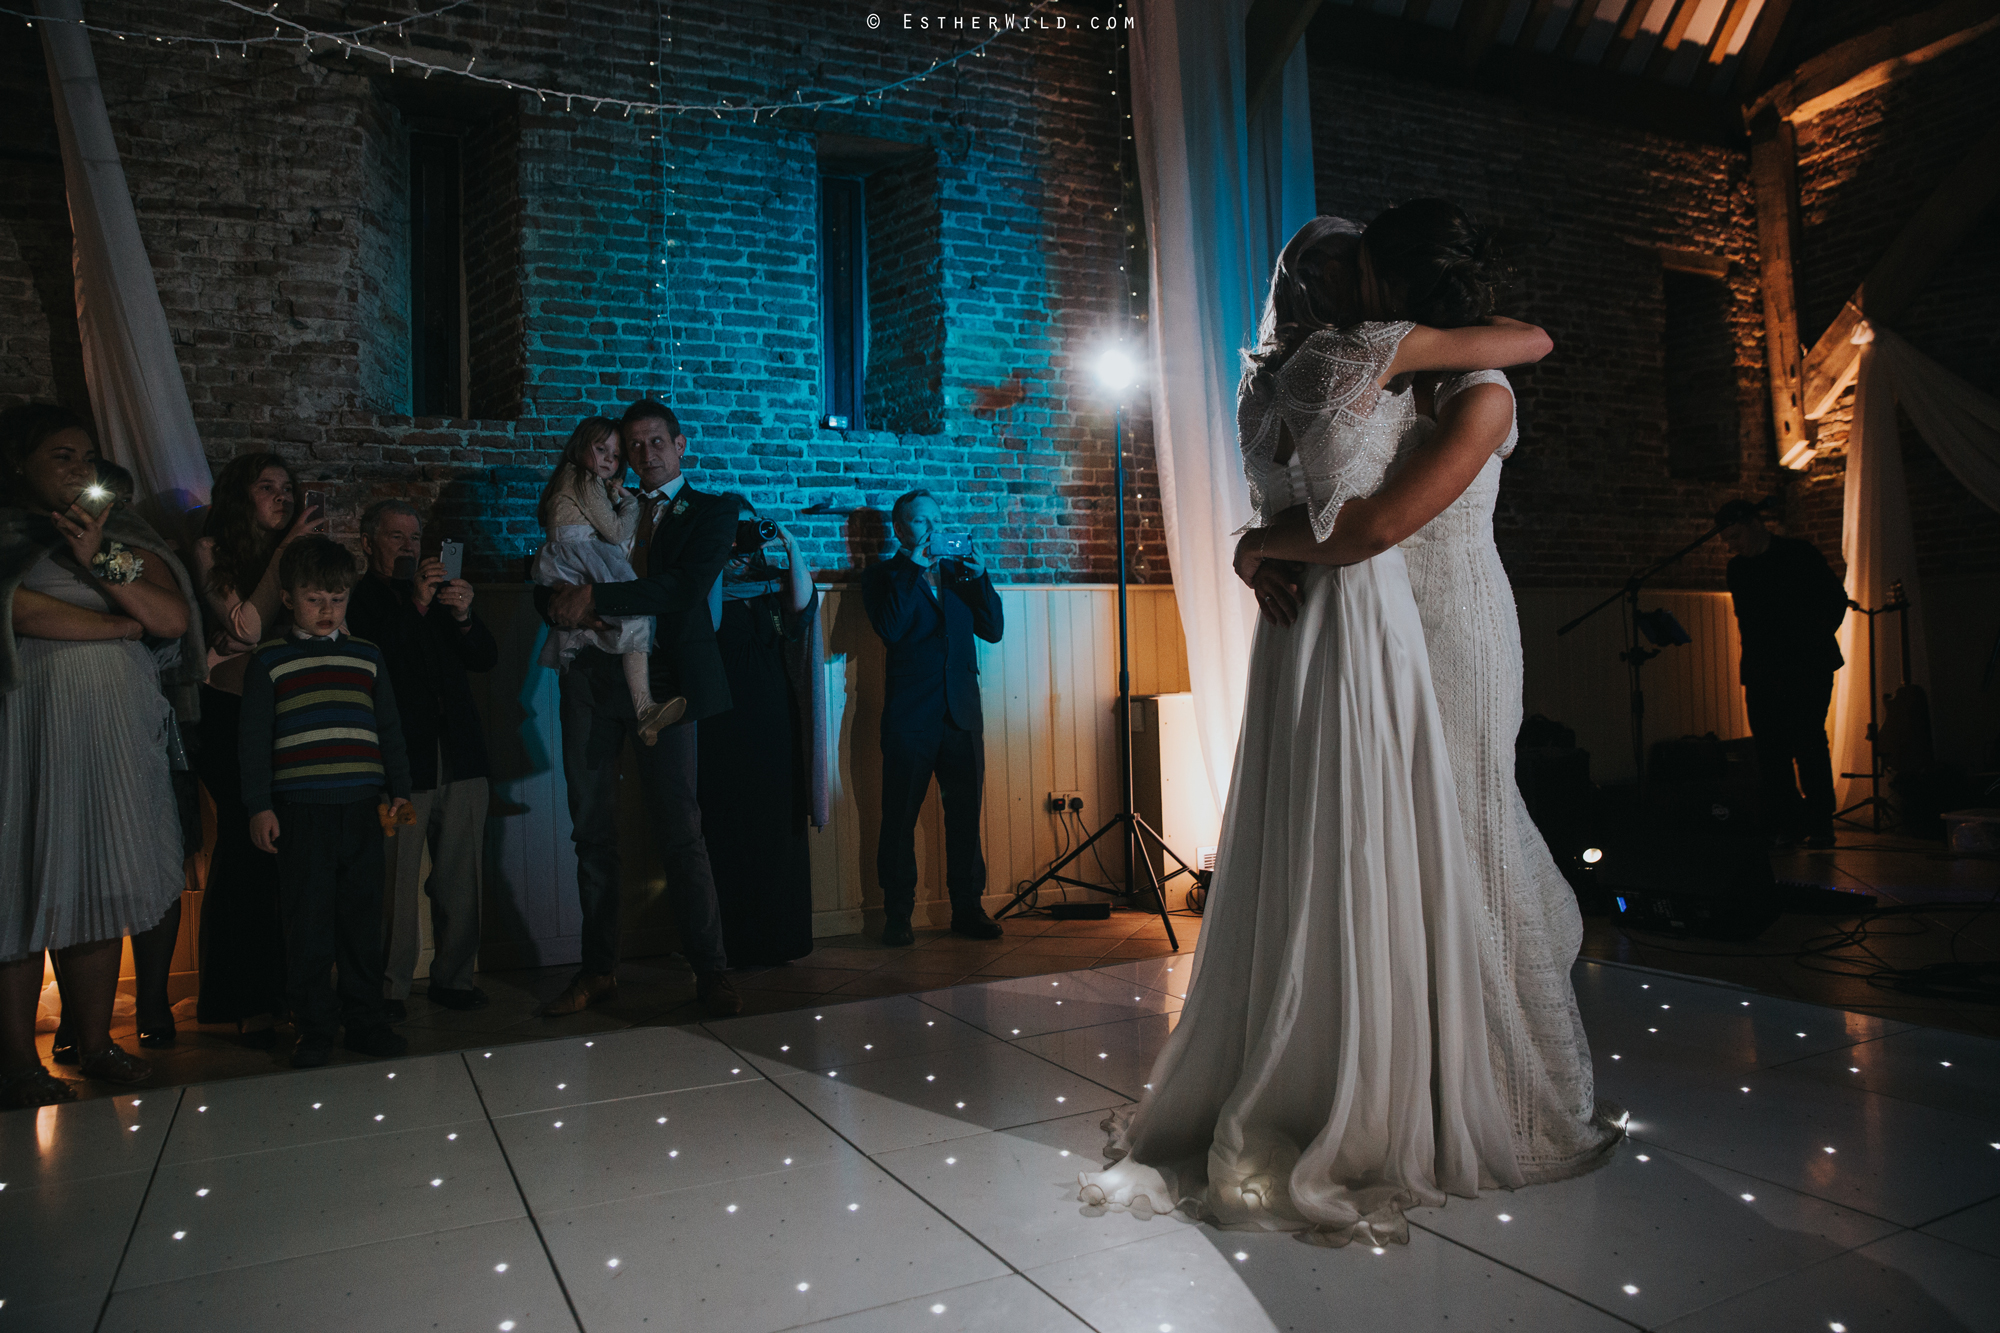 Elms_Barn_Weddings_Suffolk_Photographer_Copyright_Esther_Wild_IMG_3448.jpg